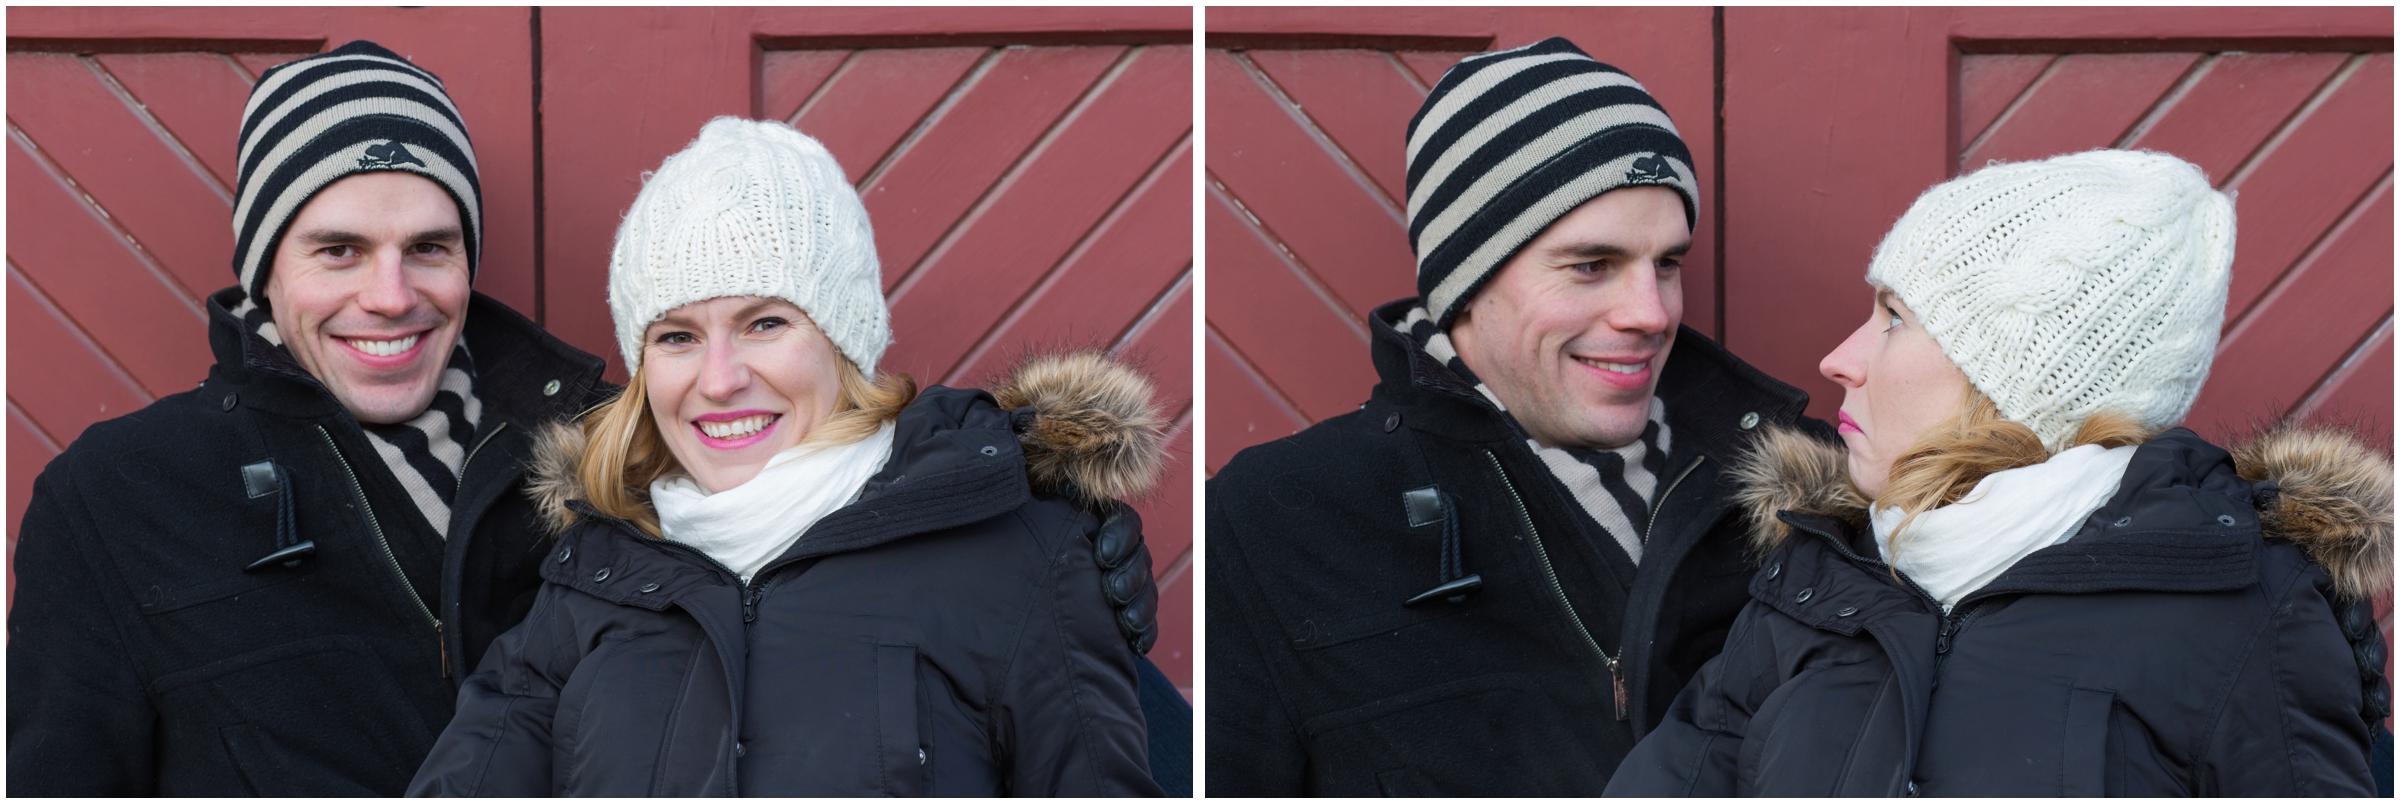 Judy and Andrew (Selena Phillips-Boyle)_0007.jpg